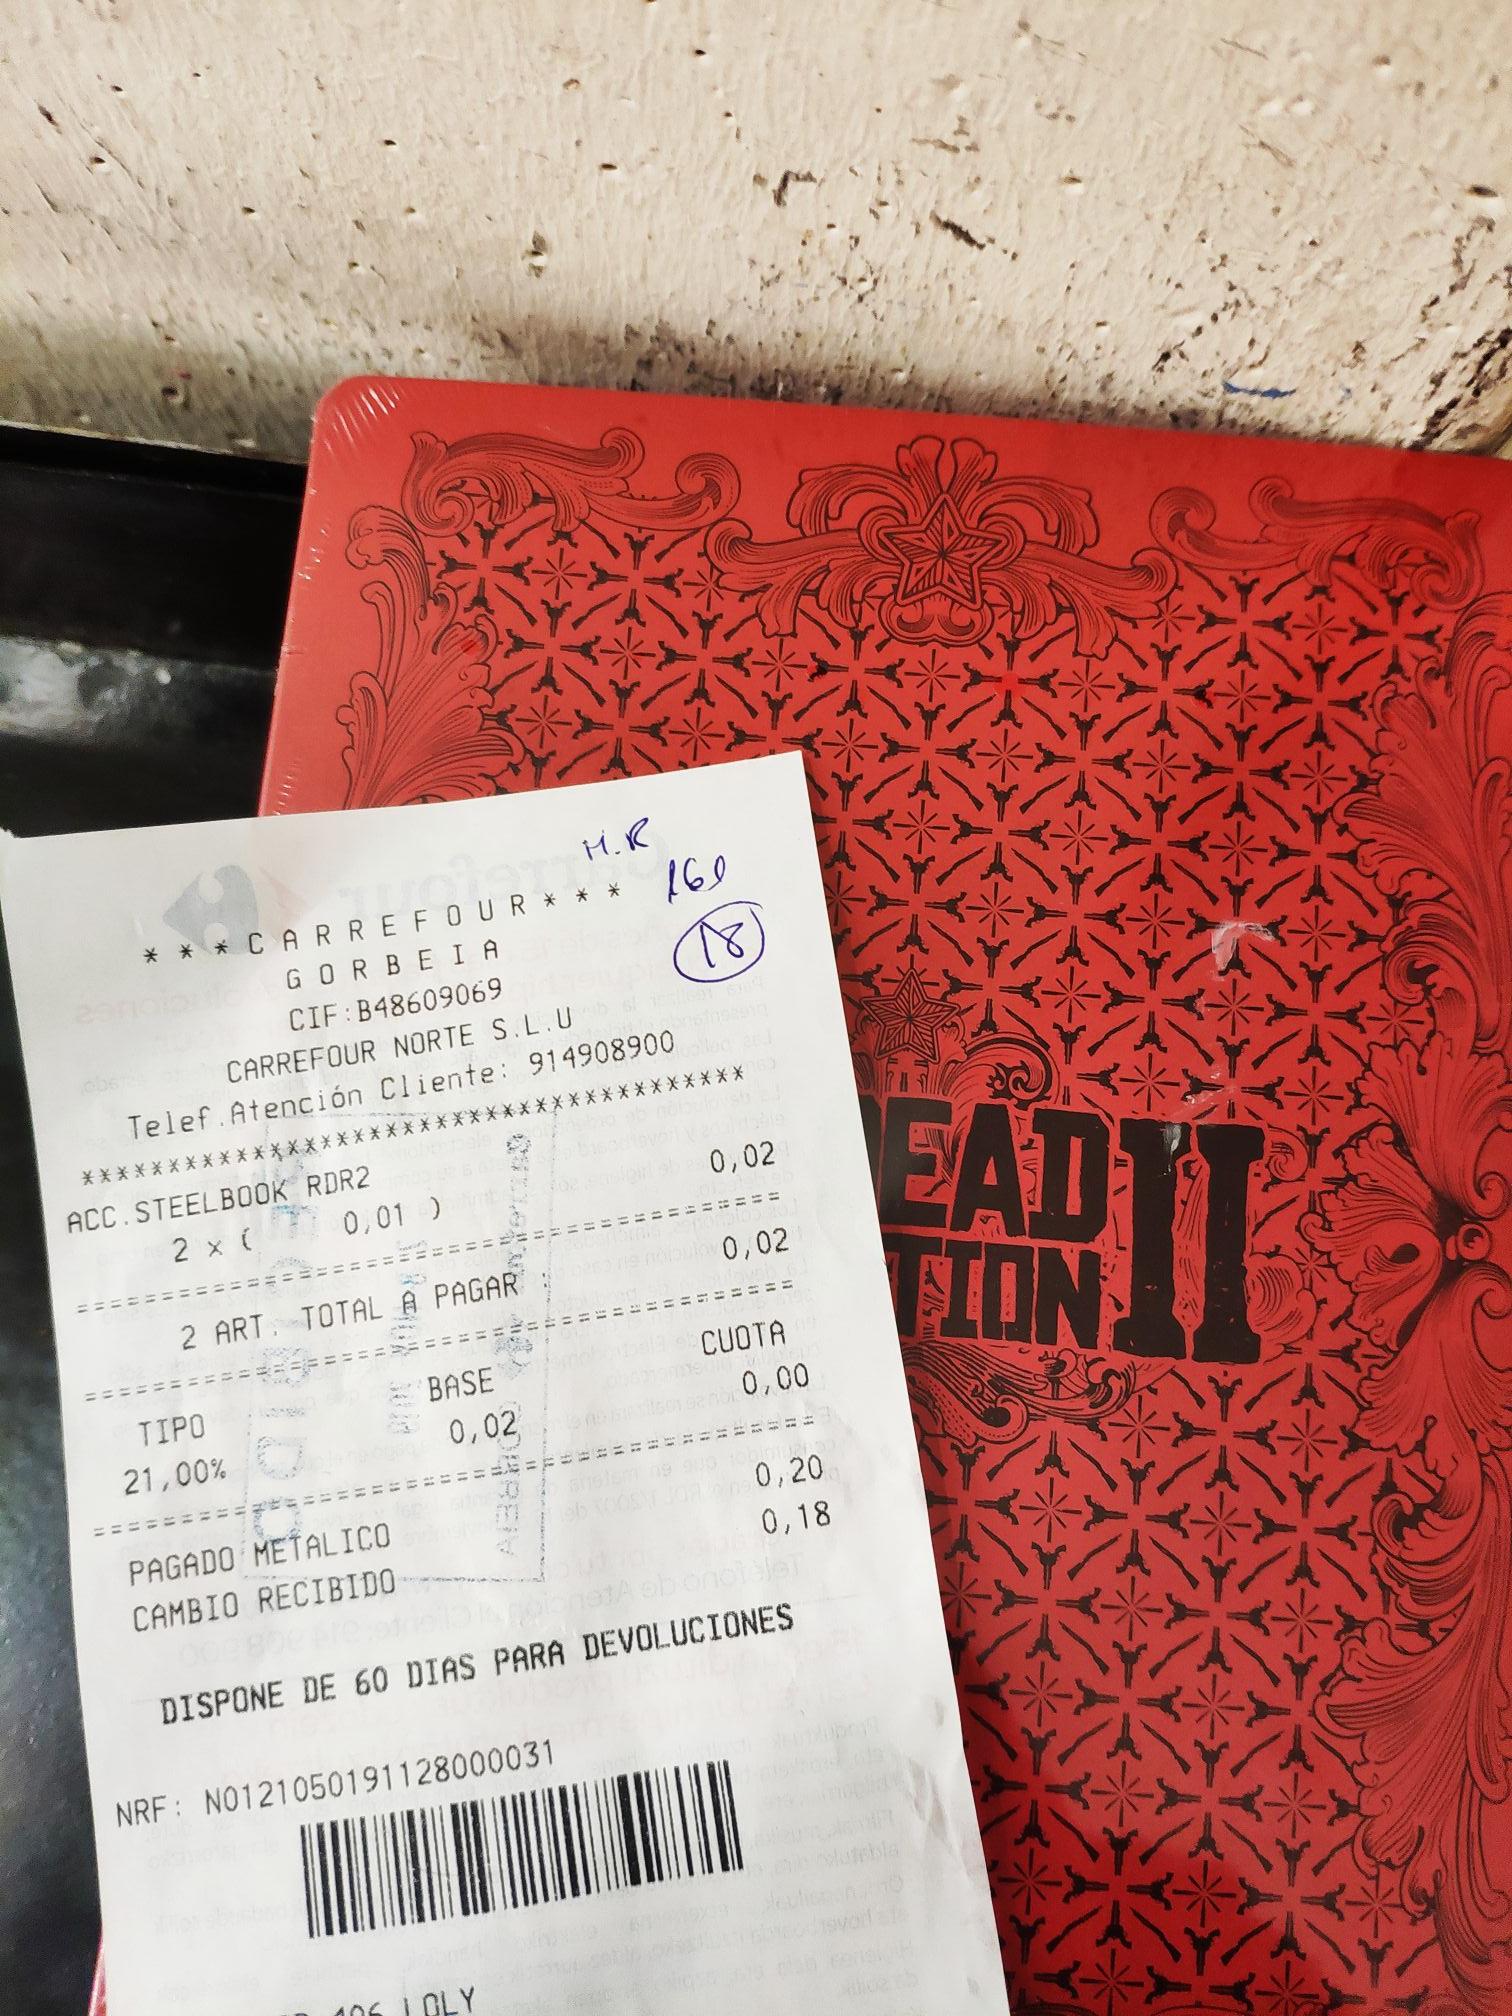 SteelBook Red Dead Redemption 1 céntimo Carrefour Vitoria